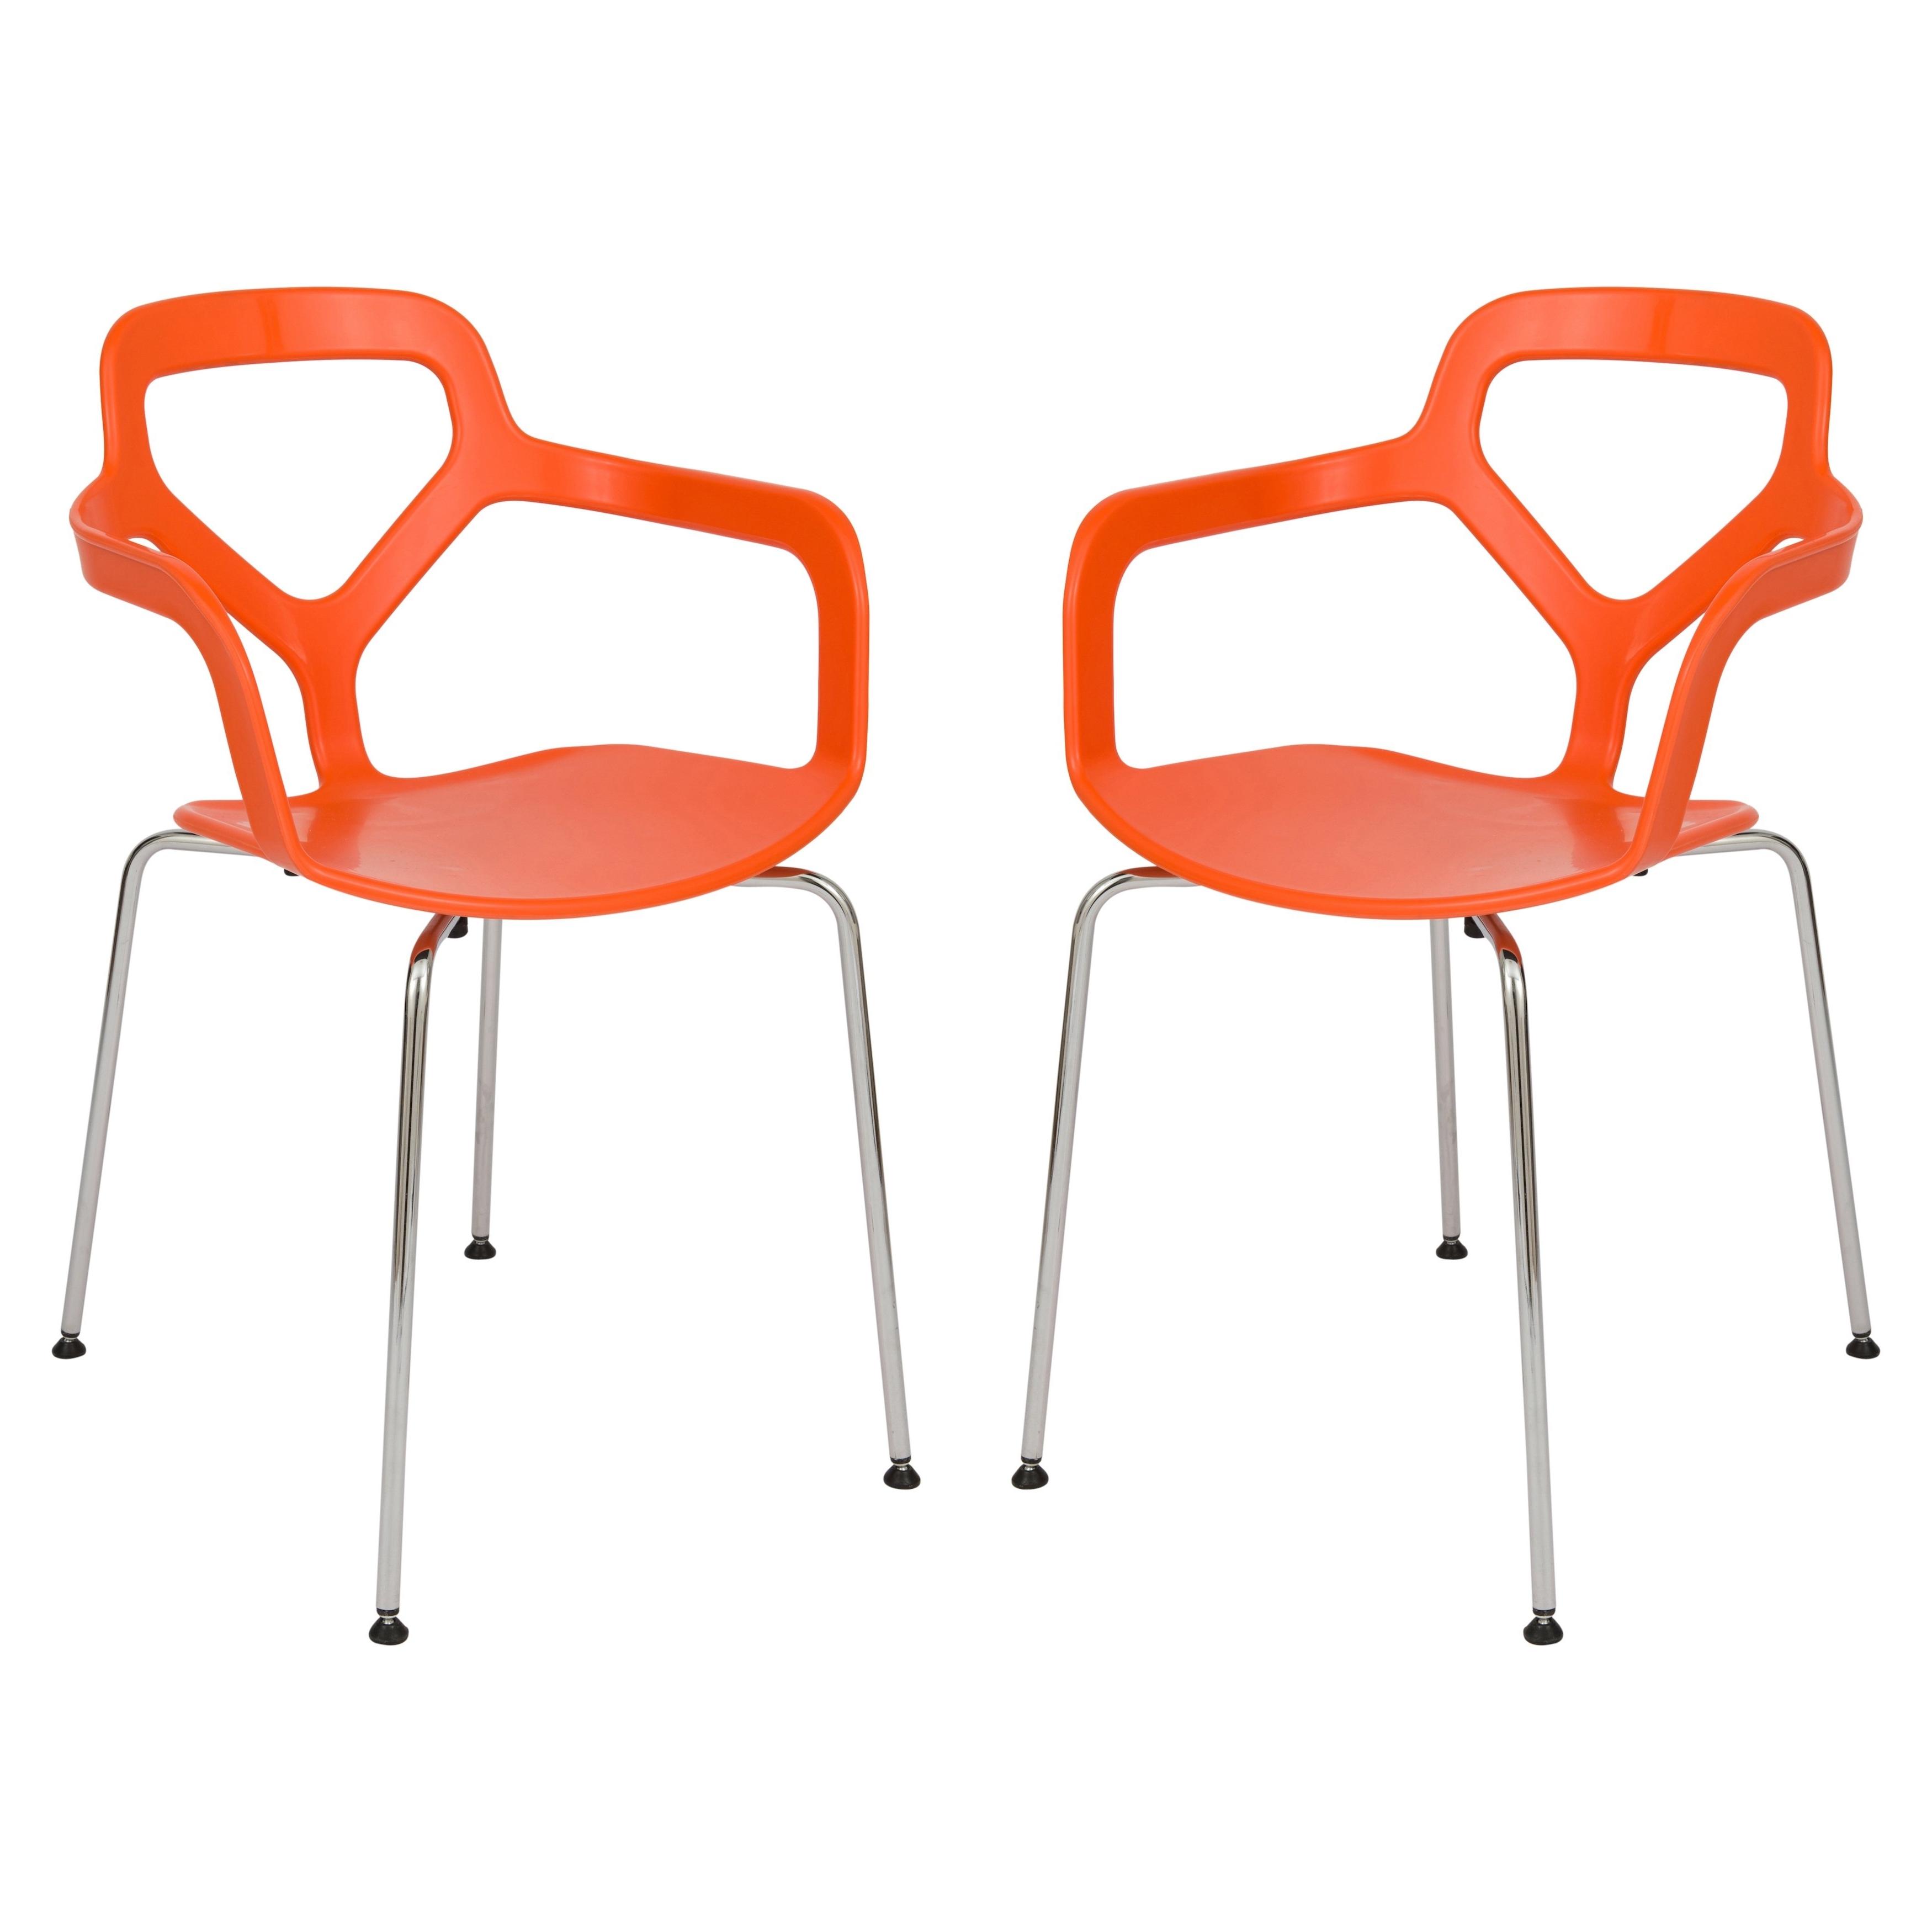 Mod Ii Arm Chairs Inside Latest Leisuremod Modern Carney Orange Arm Chair W/ Chrome Legs, Set Of (View 10 of 20)